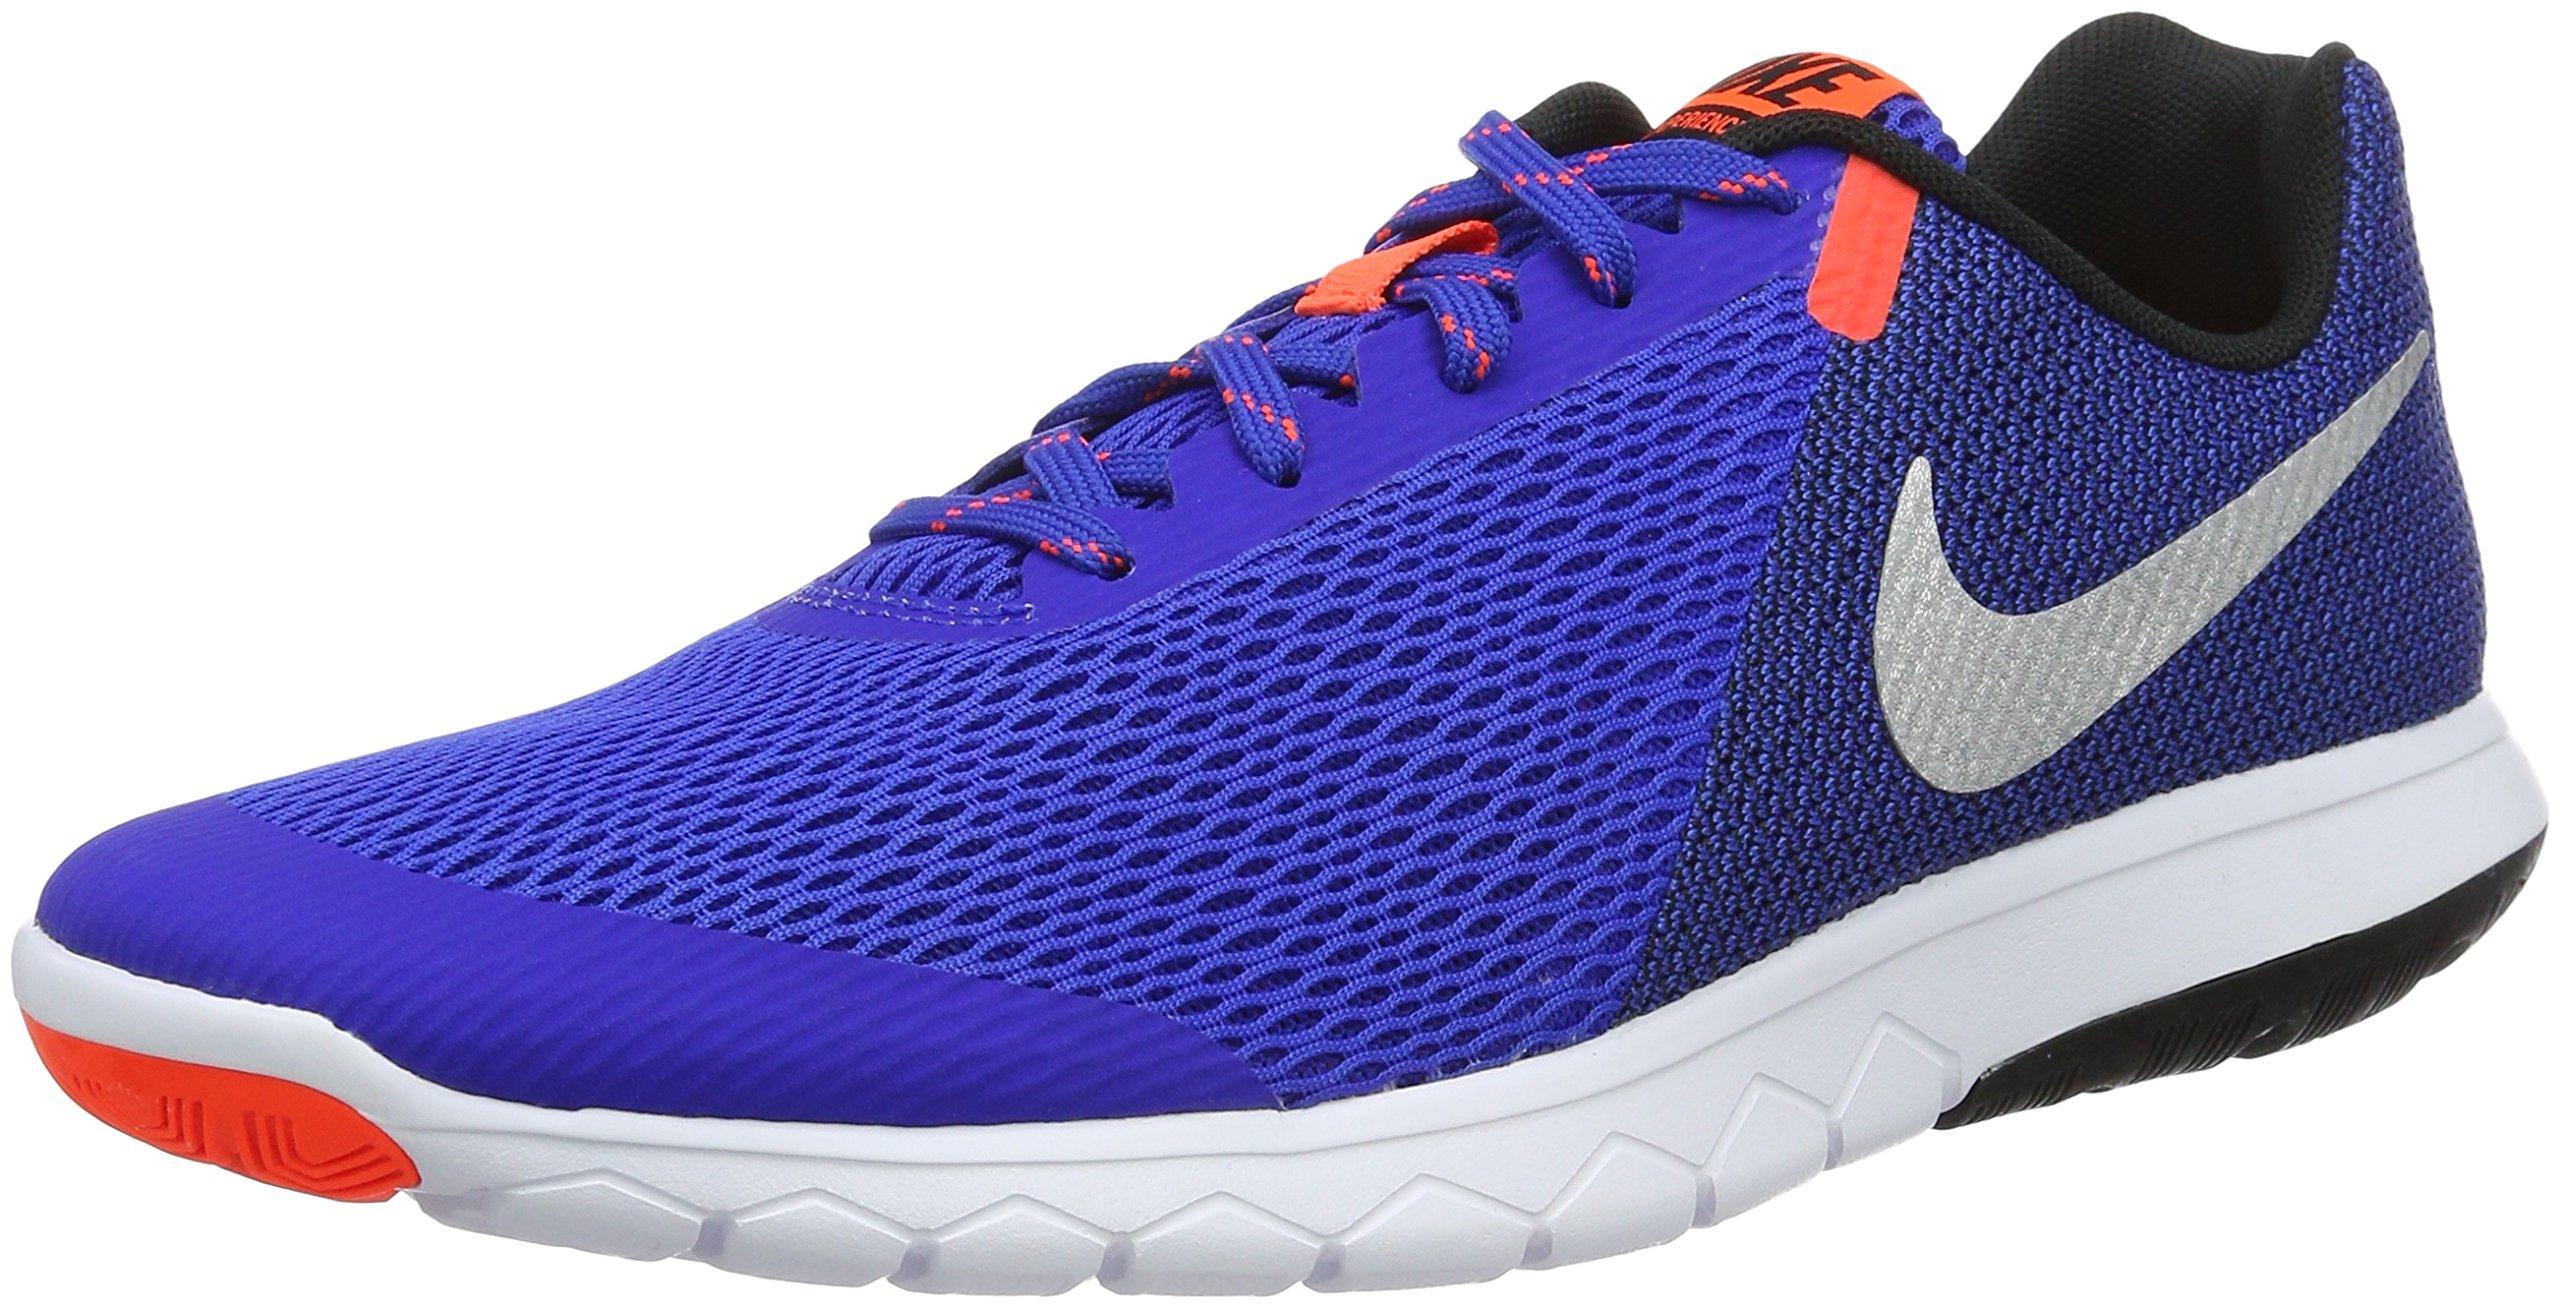 ed430a399ca17 Nike Men's Flex Experience RN 4 (Racer Blue/Metallic Silver/Black/White)  Running Shoe, 9 D(M) US